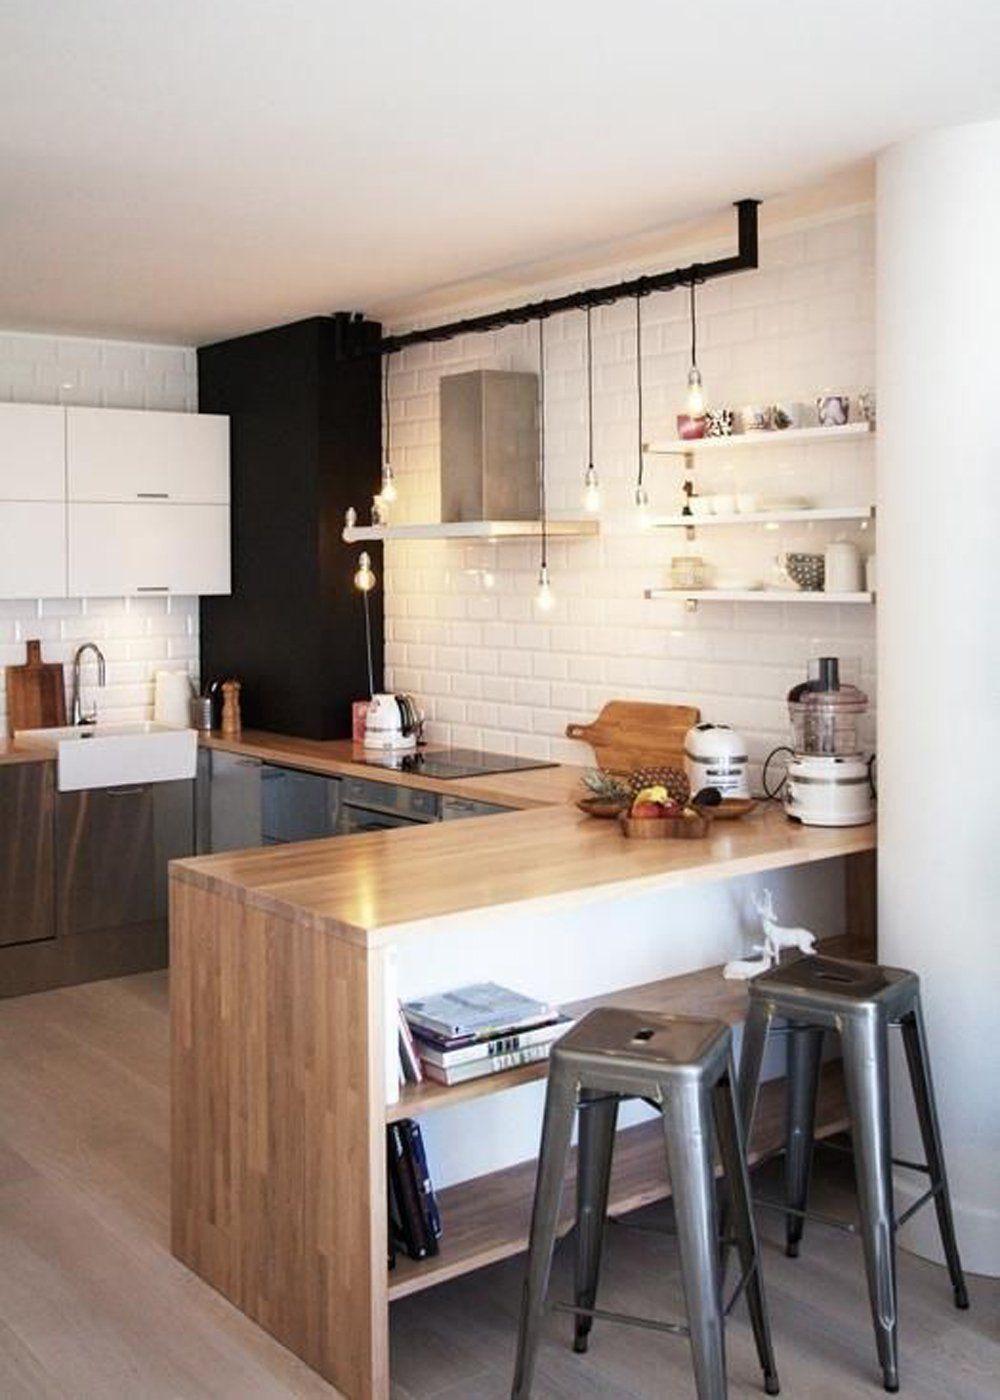 Inspiration Cuisine En U u keuken met bar - google search | cuisine moderne, cuisines